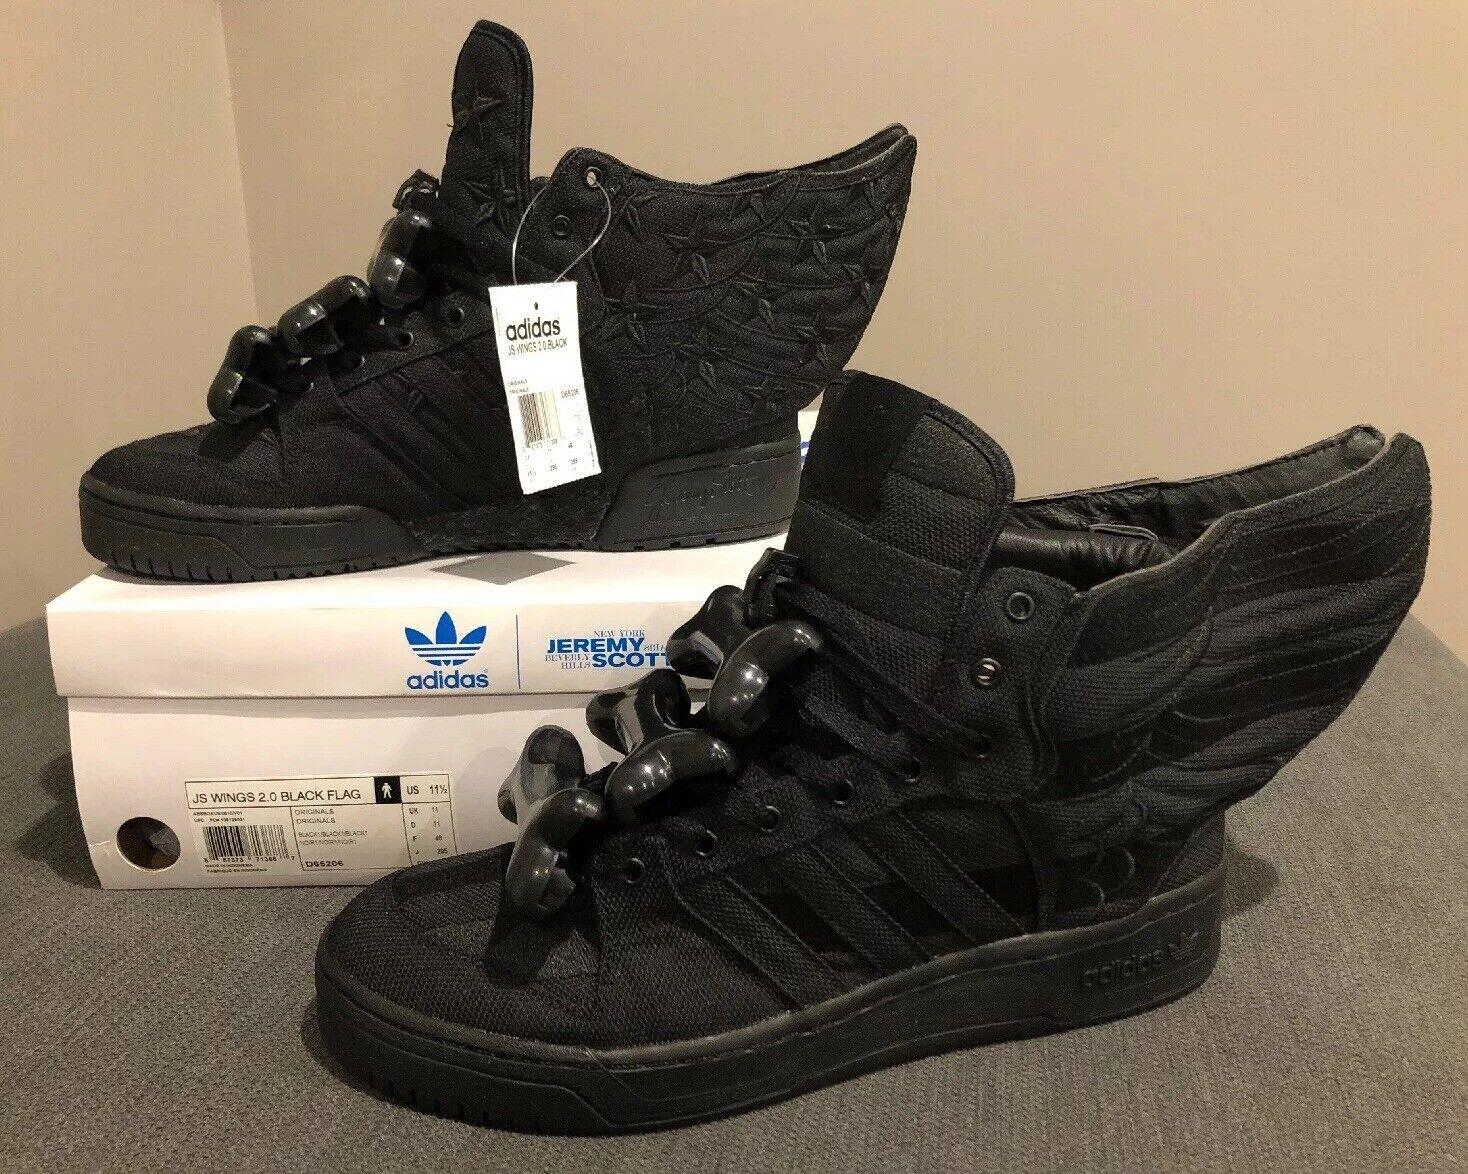 NEW Adidas Jeremy Scott Asap Rocky Black Flag Wings 2.0, Size 11.5, Very Rare